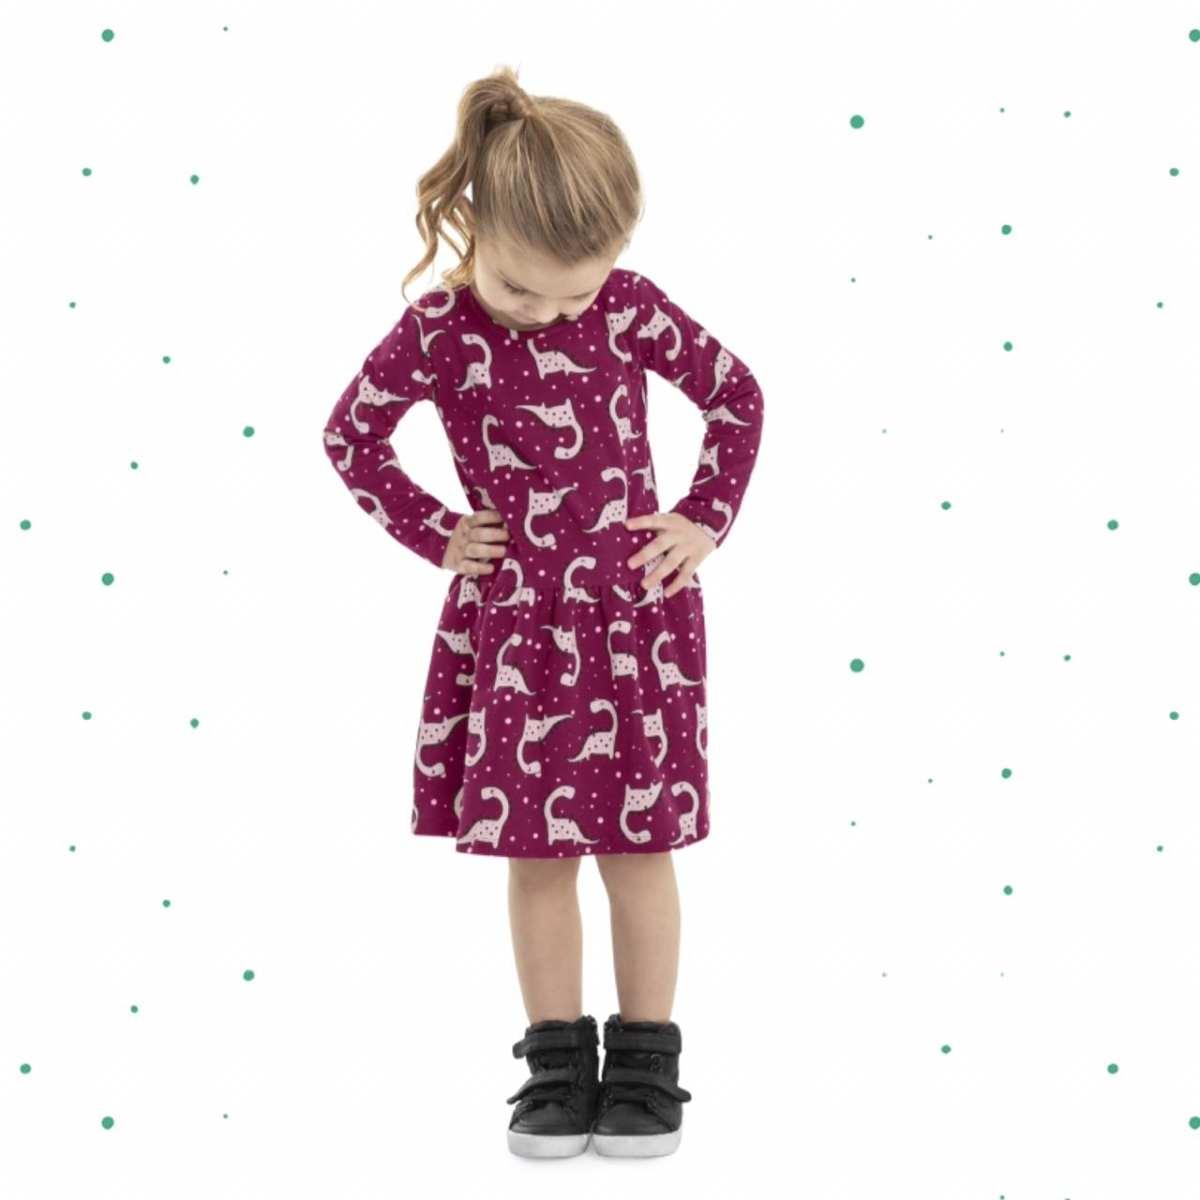 Vestido Infantil Bee Loop Estampado Manga Longa em Cotton na cor Roxa